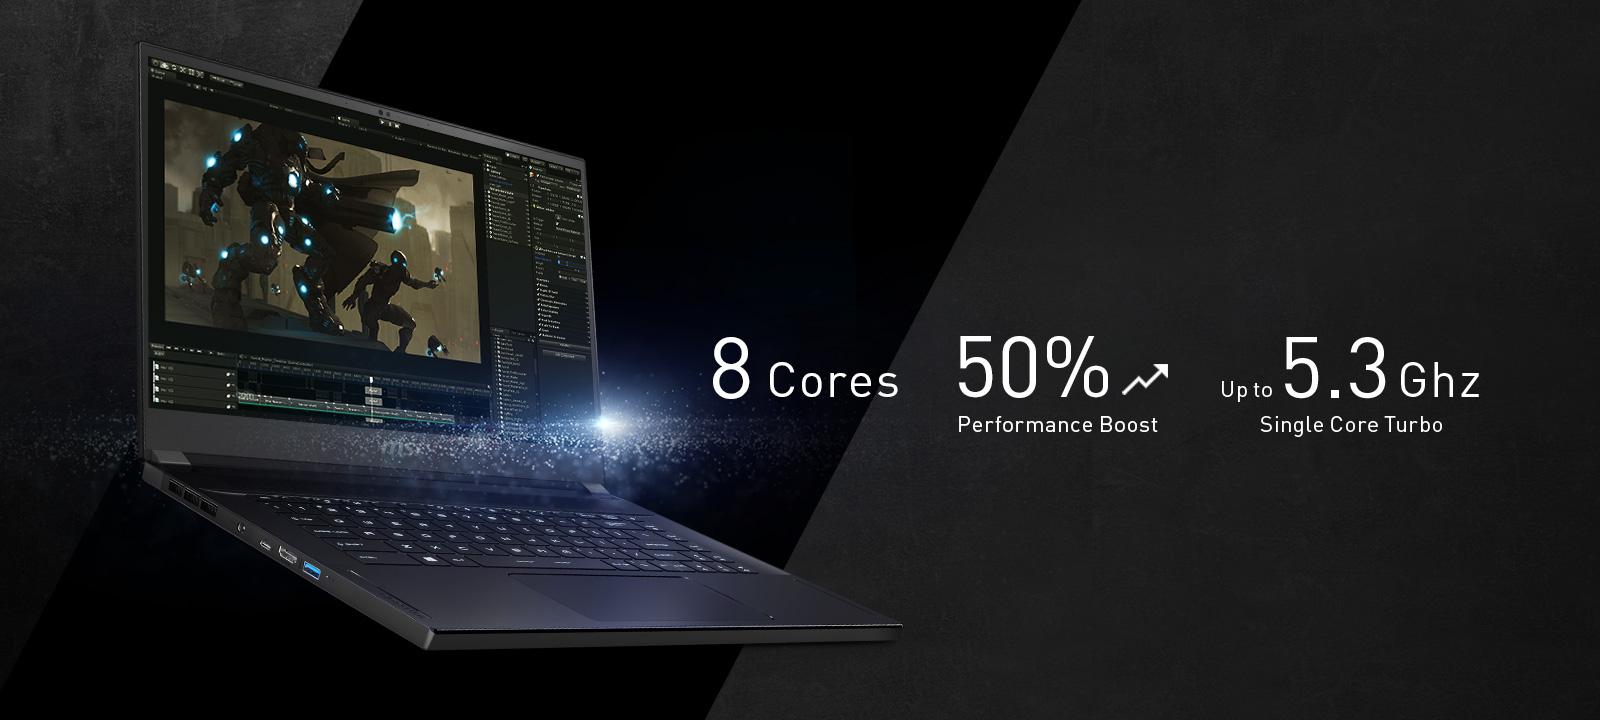 "MSI GS66 Stealth 10SE-442 - 15.6"" 240 Hz - Intel Core i7-10875H - GeForce RTX 2060 - 16 GB DDR4 - 512 GB SSD - Gaming Laptop - Newegg.com"